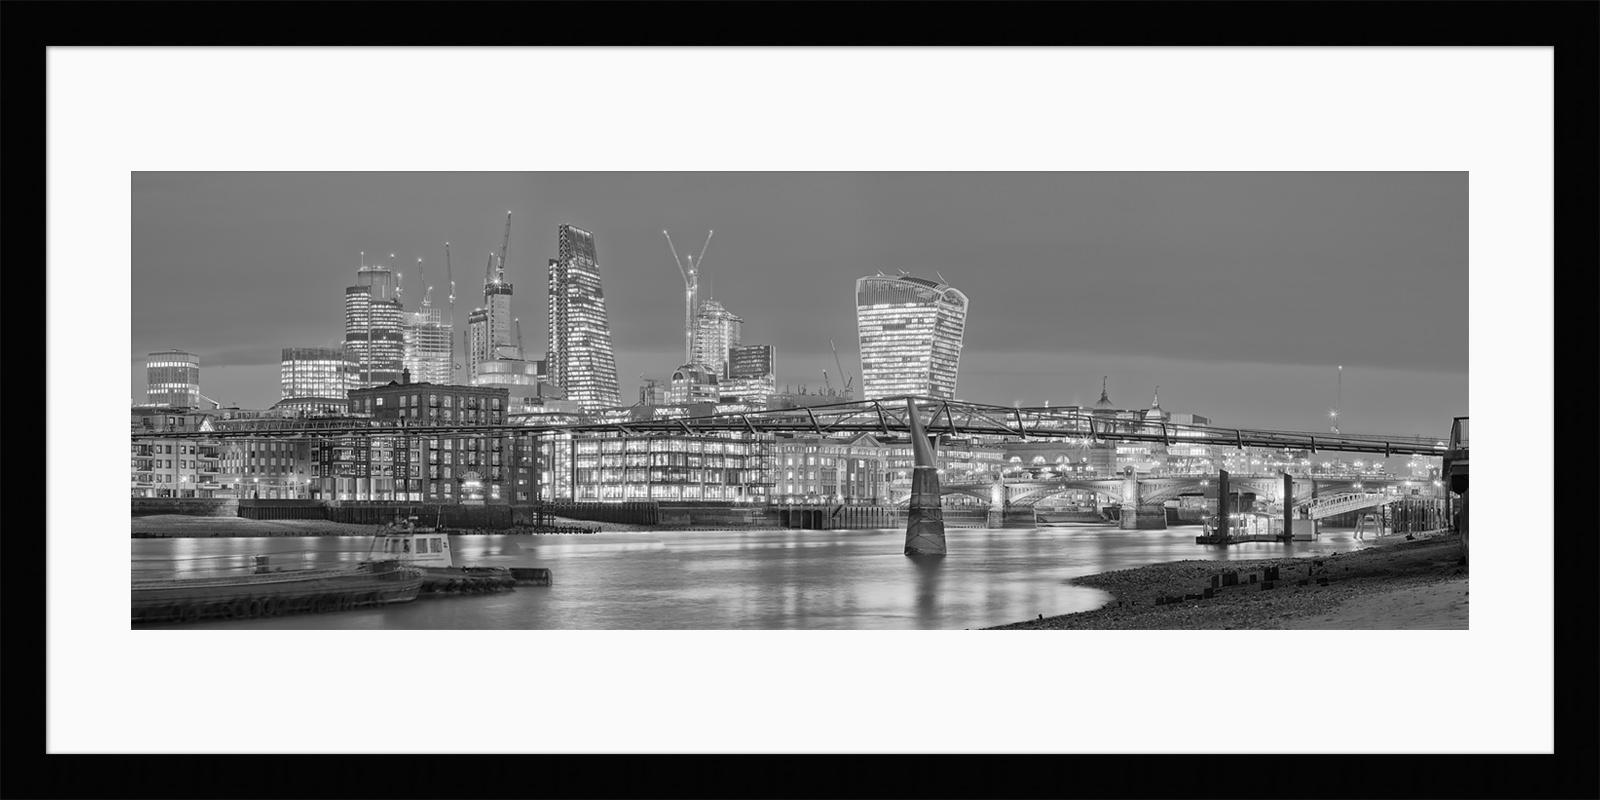 Low Tide at Millennium Bridge - Will Pearson Framed Fine Art Photographic Print